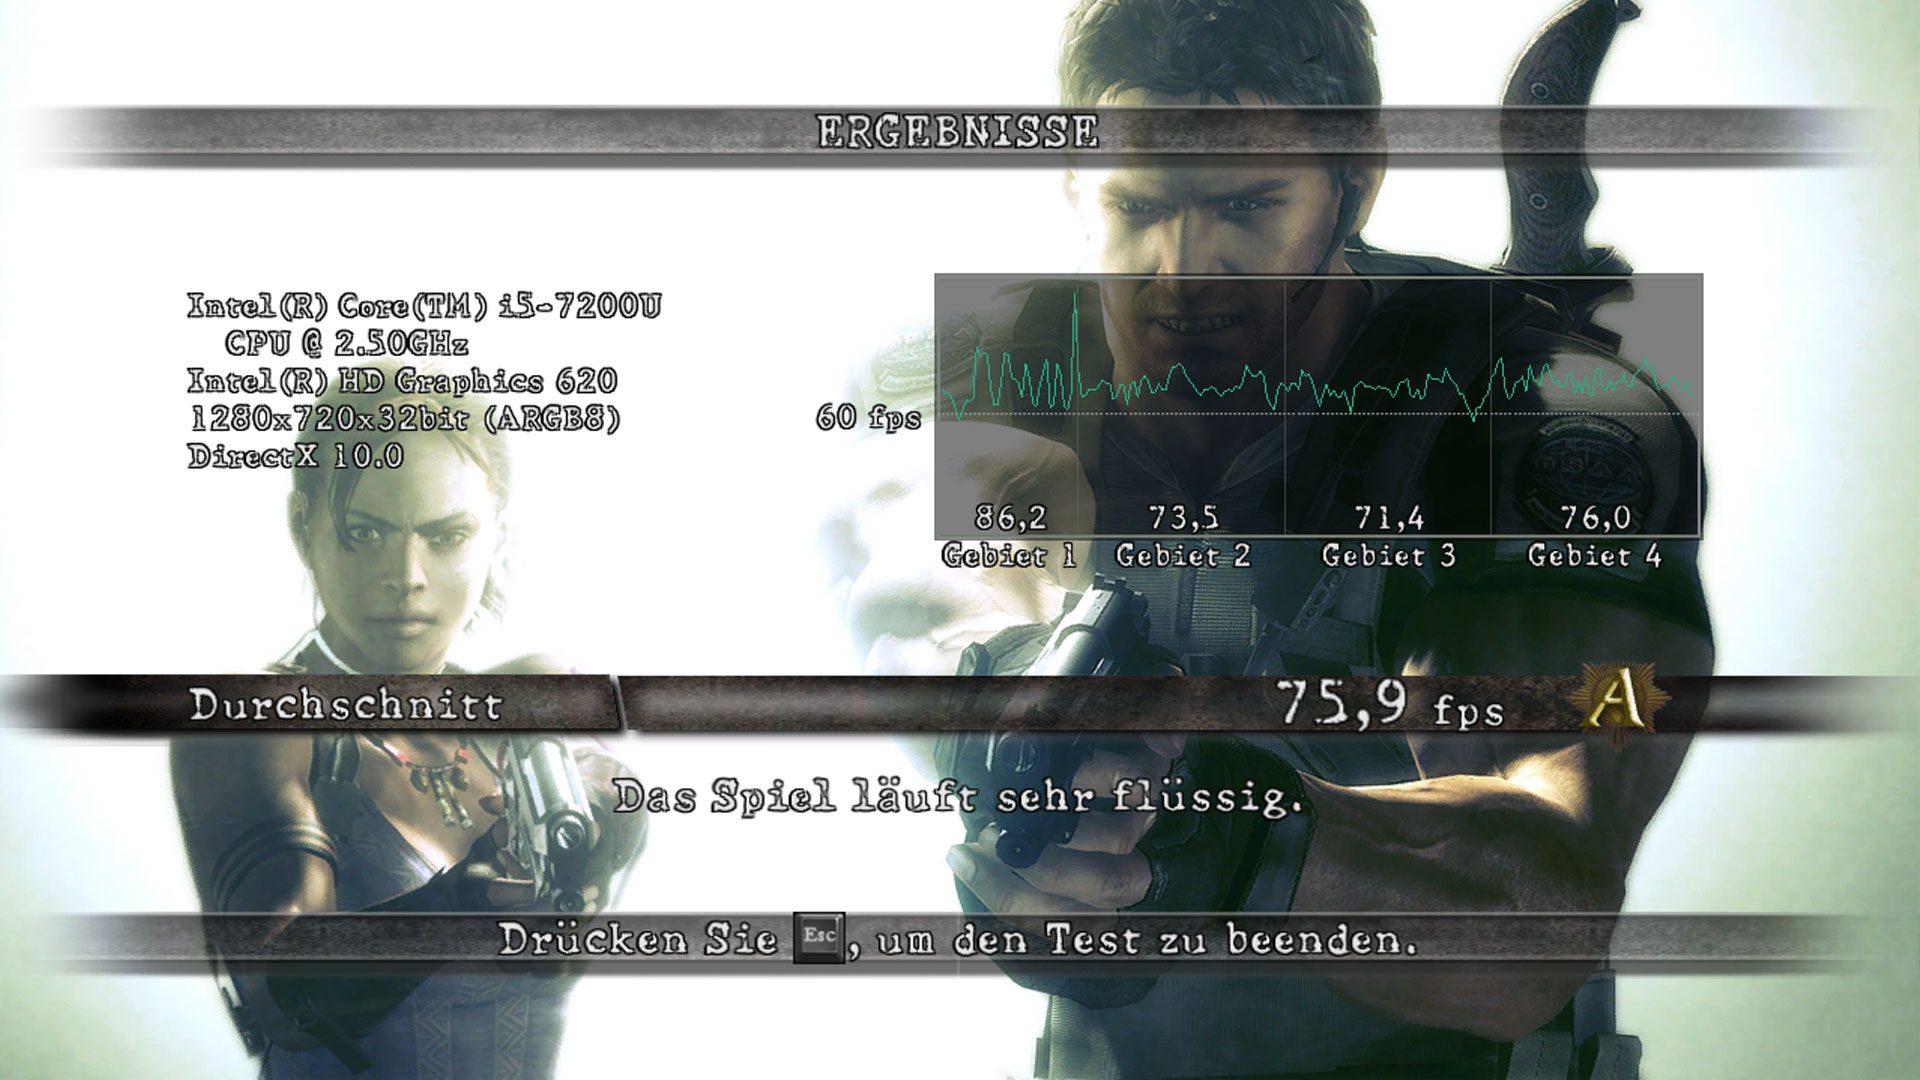 HP-Spectre-x360-13-ac000ng_Grafik-9